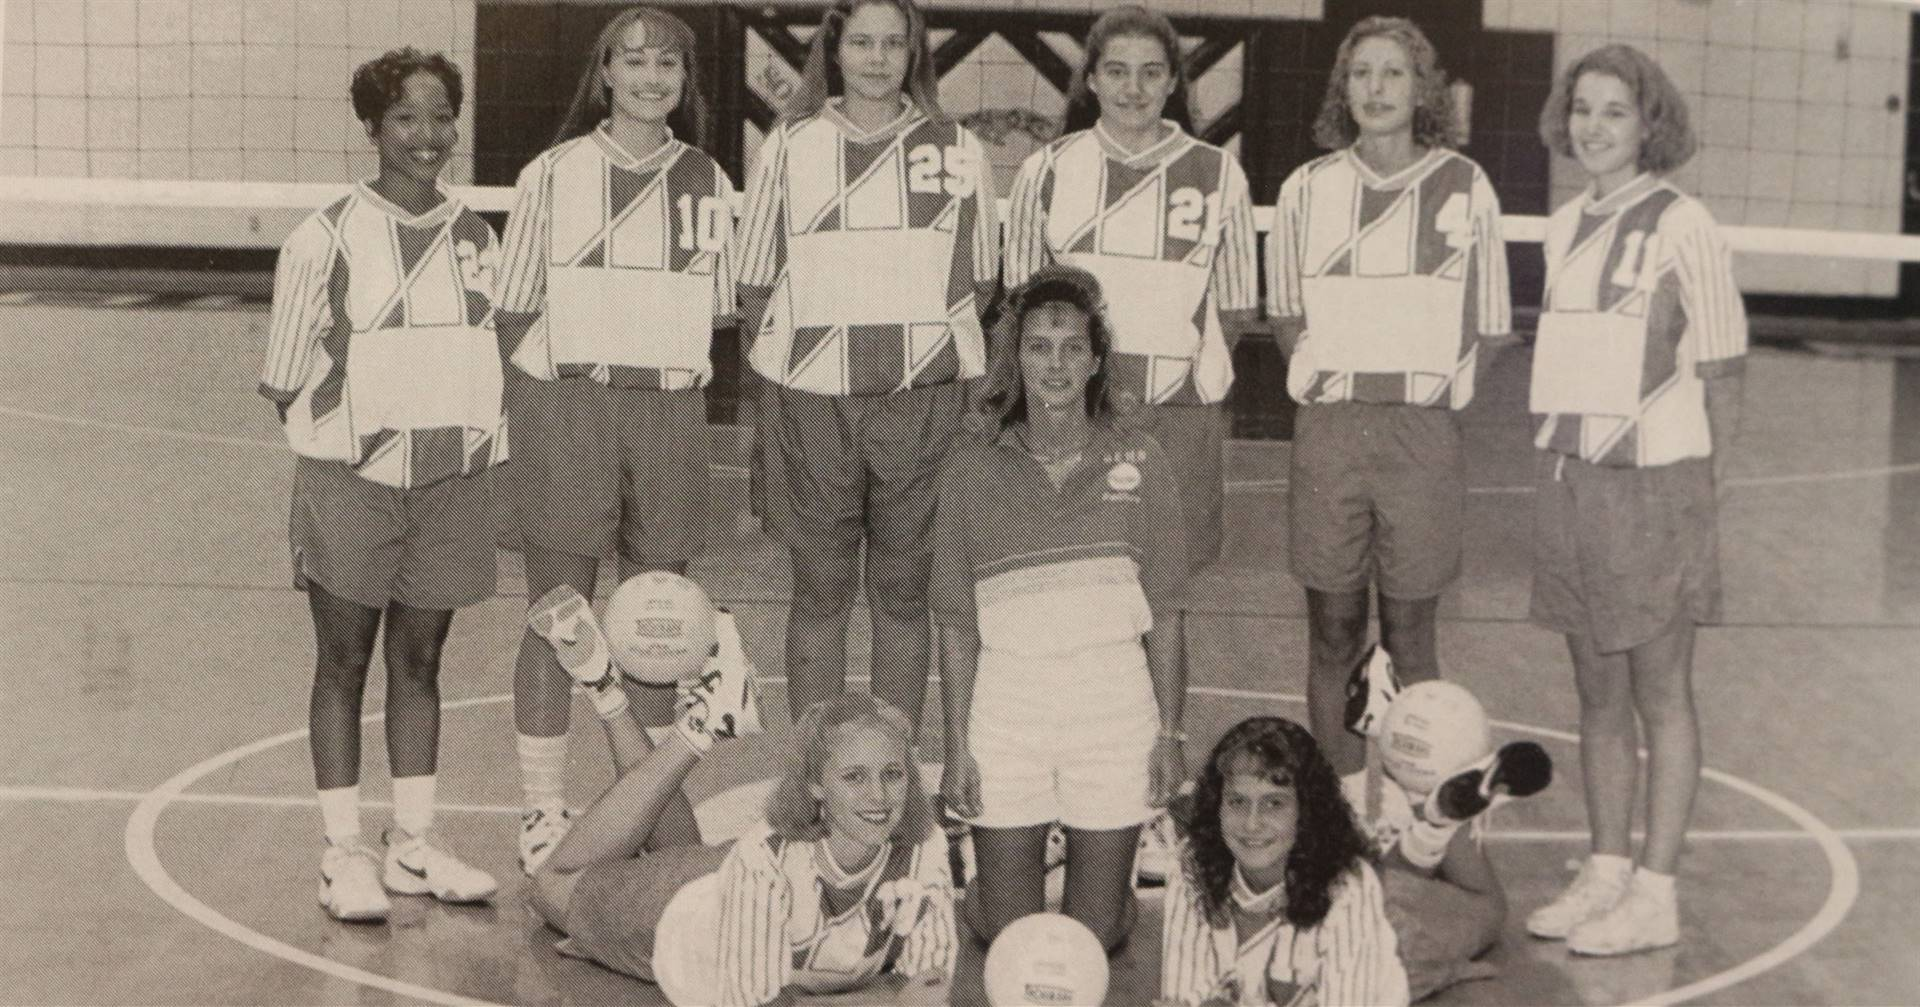 1997 Vollyball Team